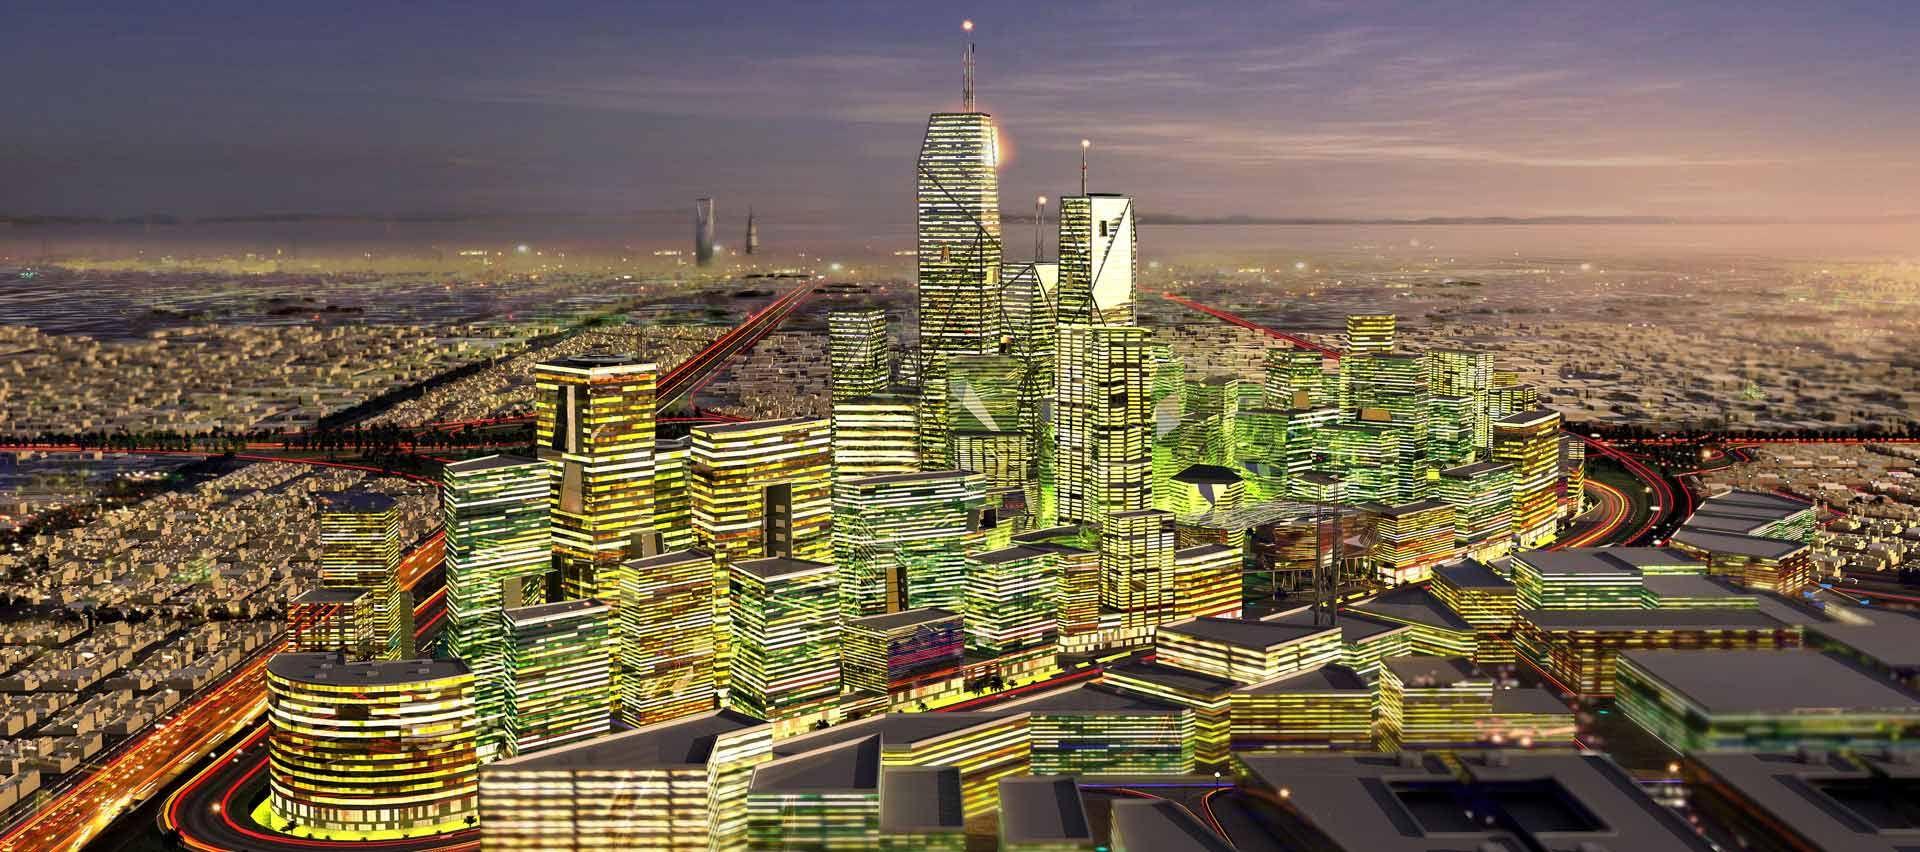 King Abdullah Financial District Riyadh Henning Larsen Architects Financial District Architecture Presentation City Design